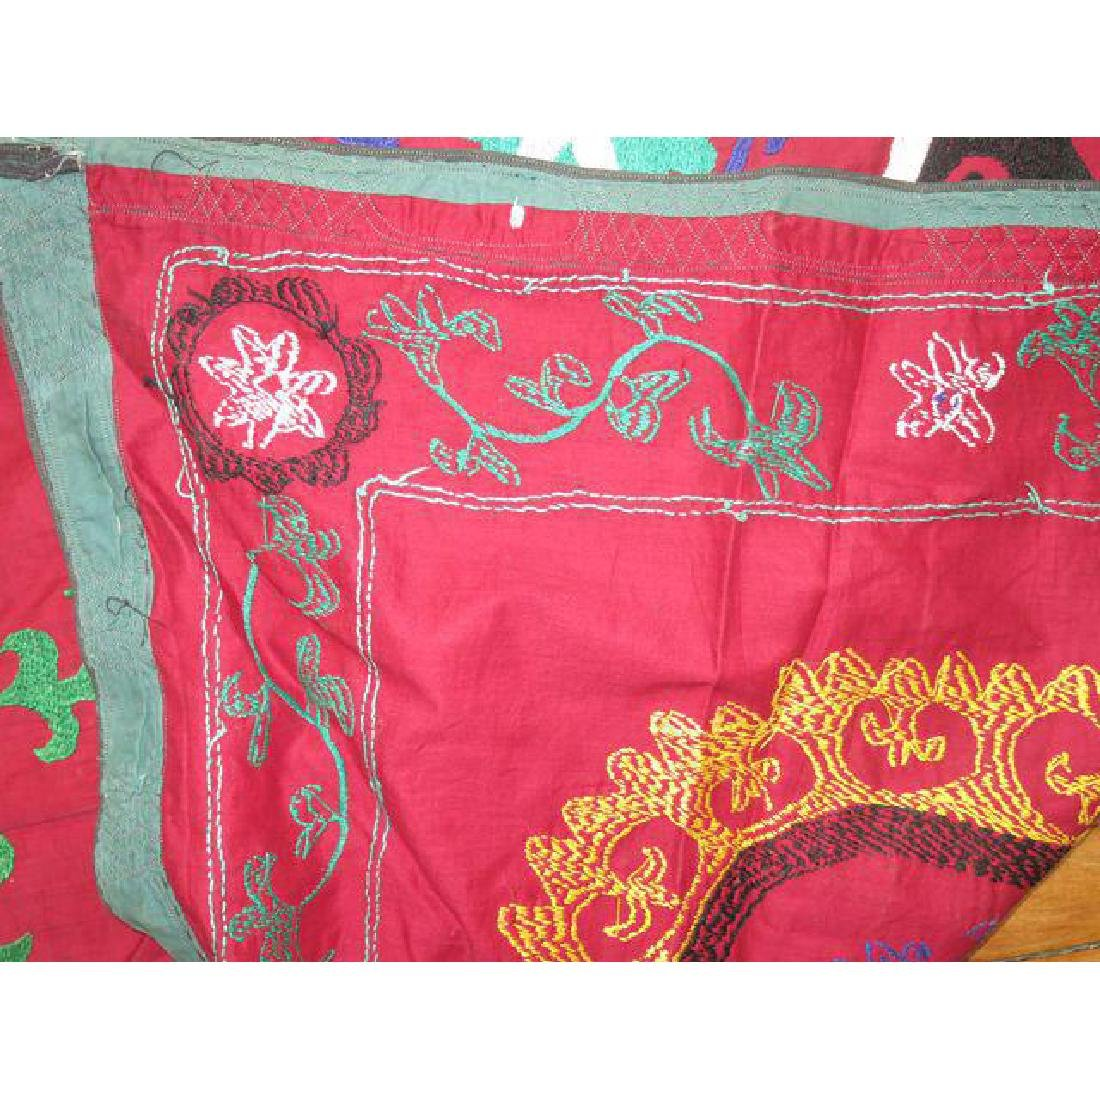 Vintage Suzanni Embroidery Throw 6.10x7.5 - 7